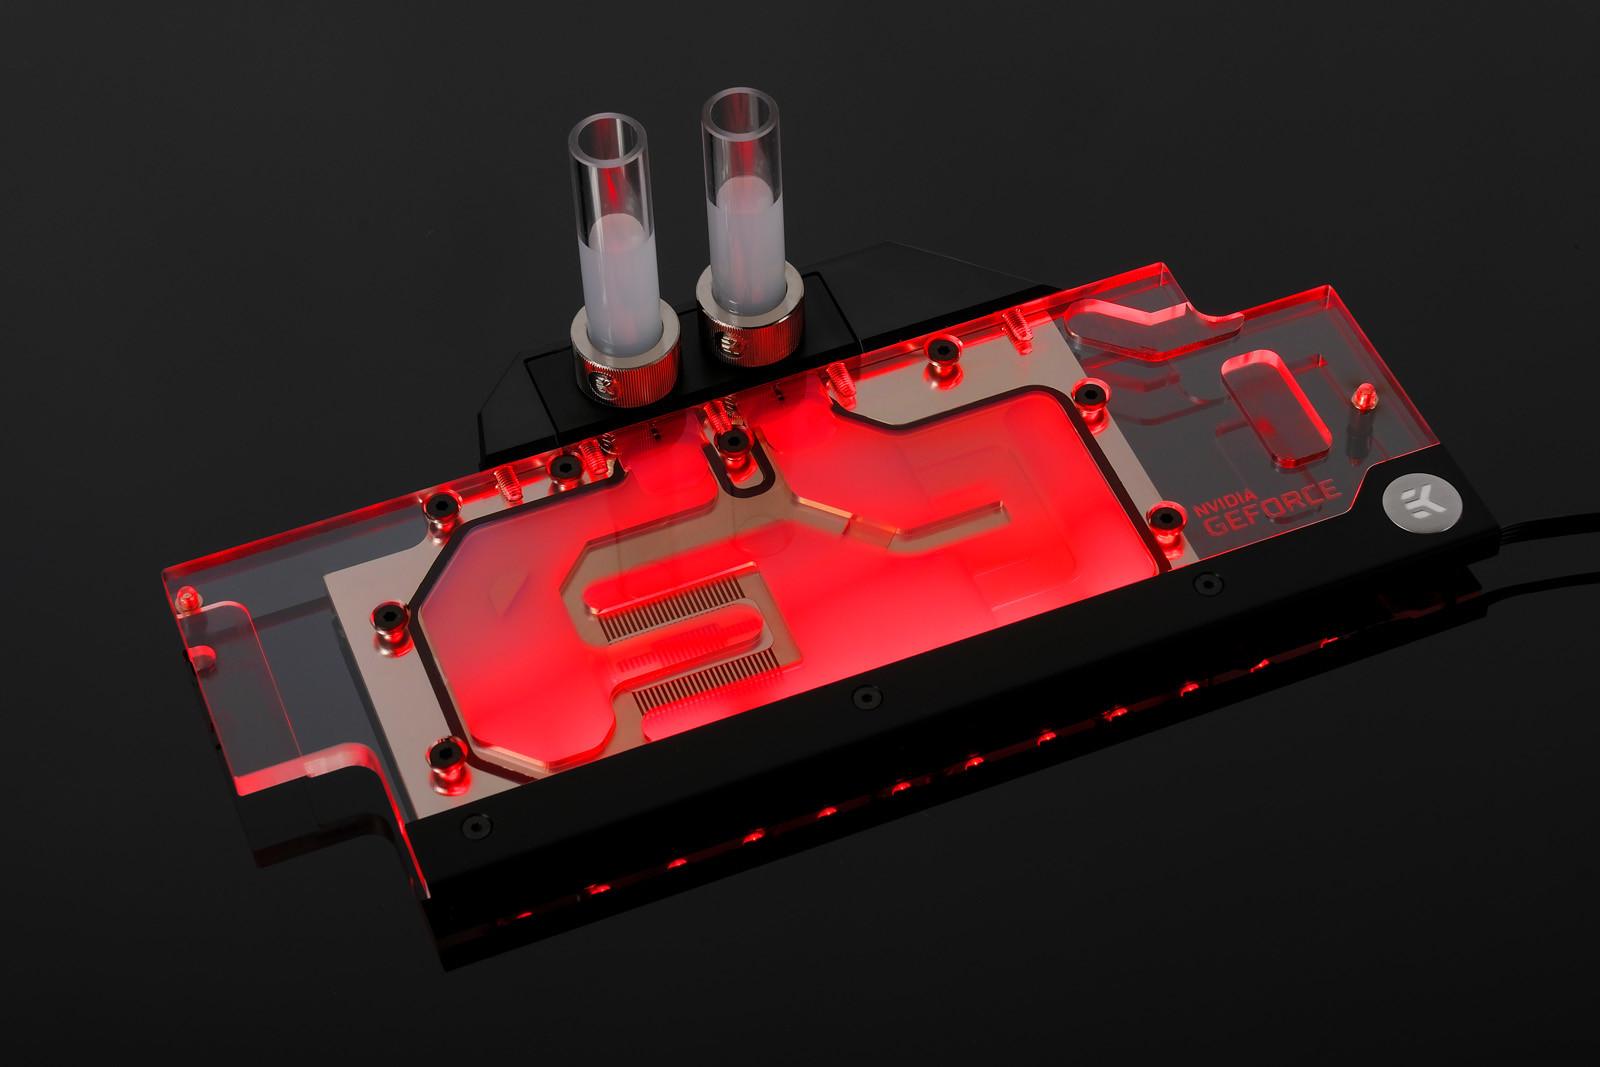 EK Releases Full-Cover Water Blocks for ASUS GTX 1070 Ti | TechPowerUp